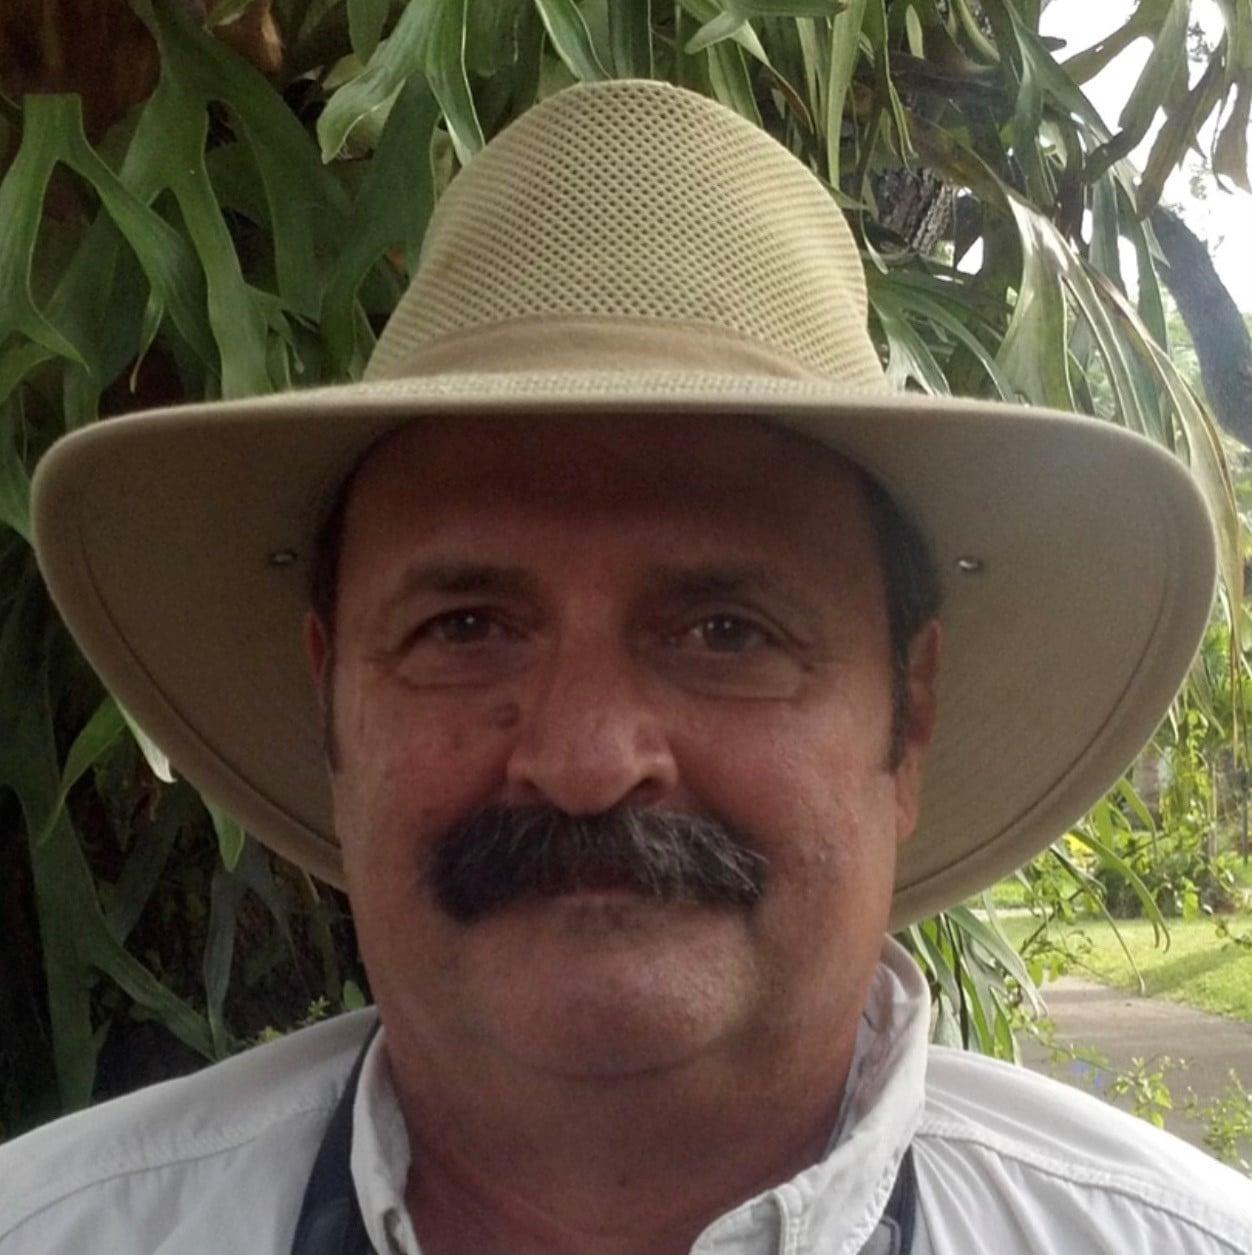 Paul Bithorn, former Mayor of the Village of Virginia Gardens (Photo courtesy of the Village of Virginia Gardens Twitter)